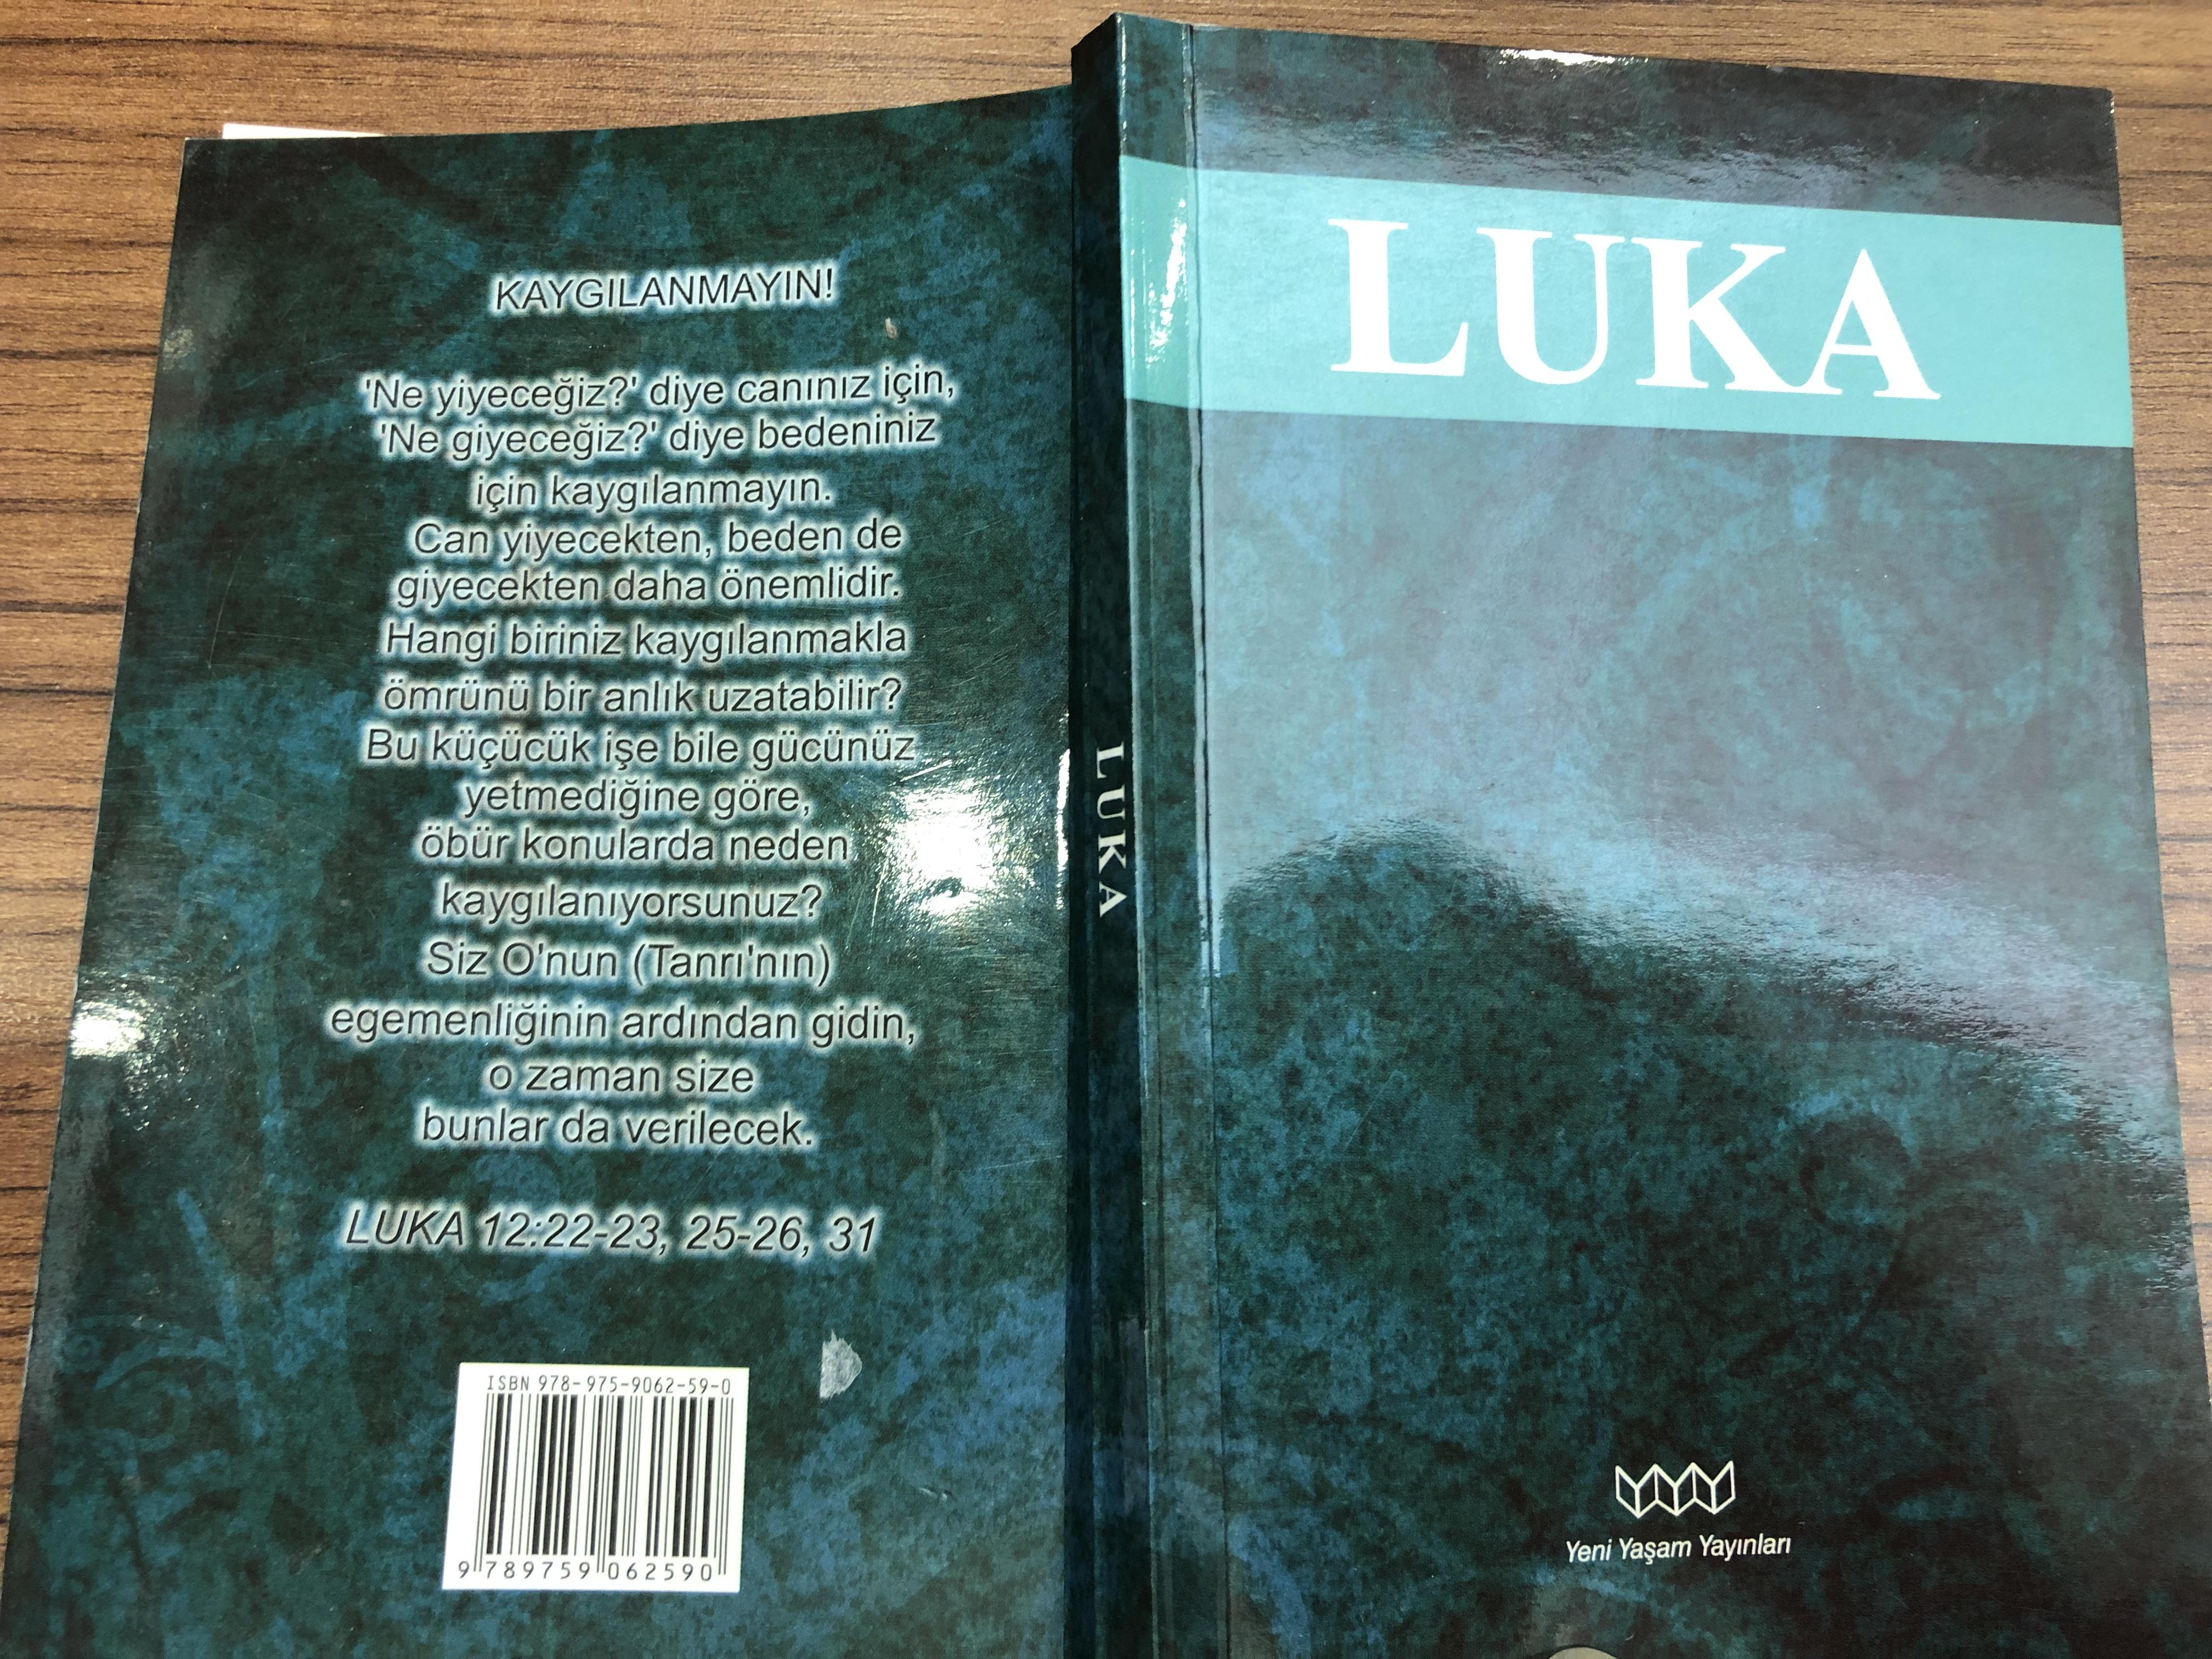 -ncil-luka-the-gospel-according-to-luke-in-turkish-language7.jpg